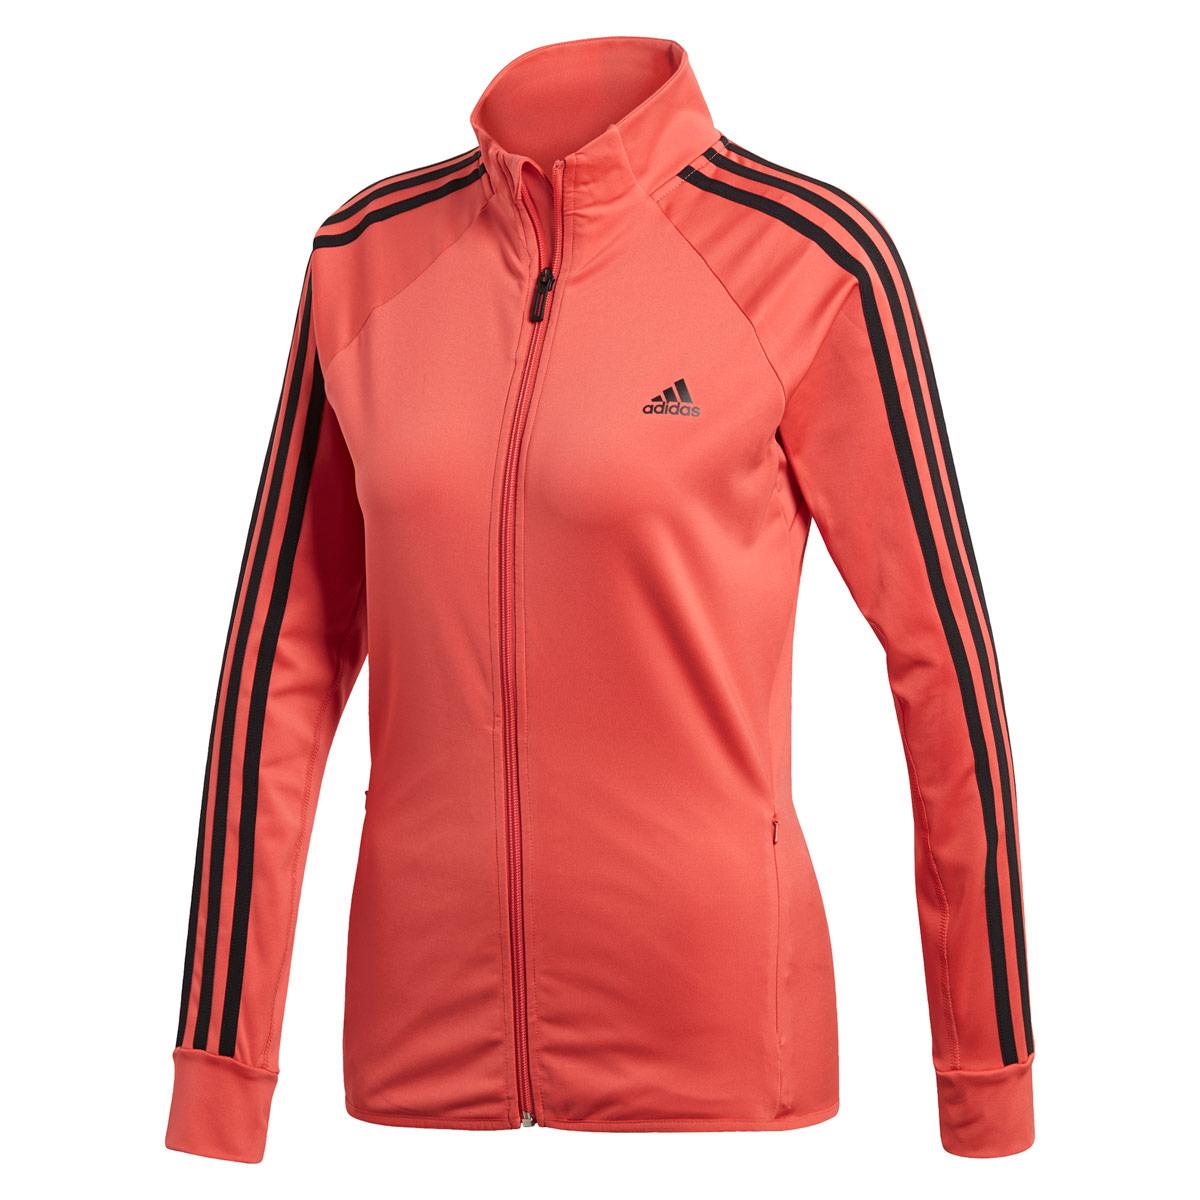 adidas D2m Track Jacke - Laufjacken für Damen - Rot